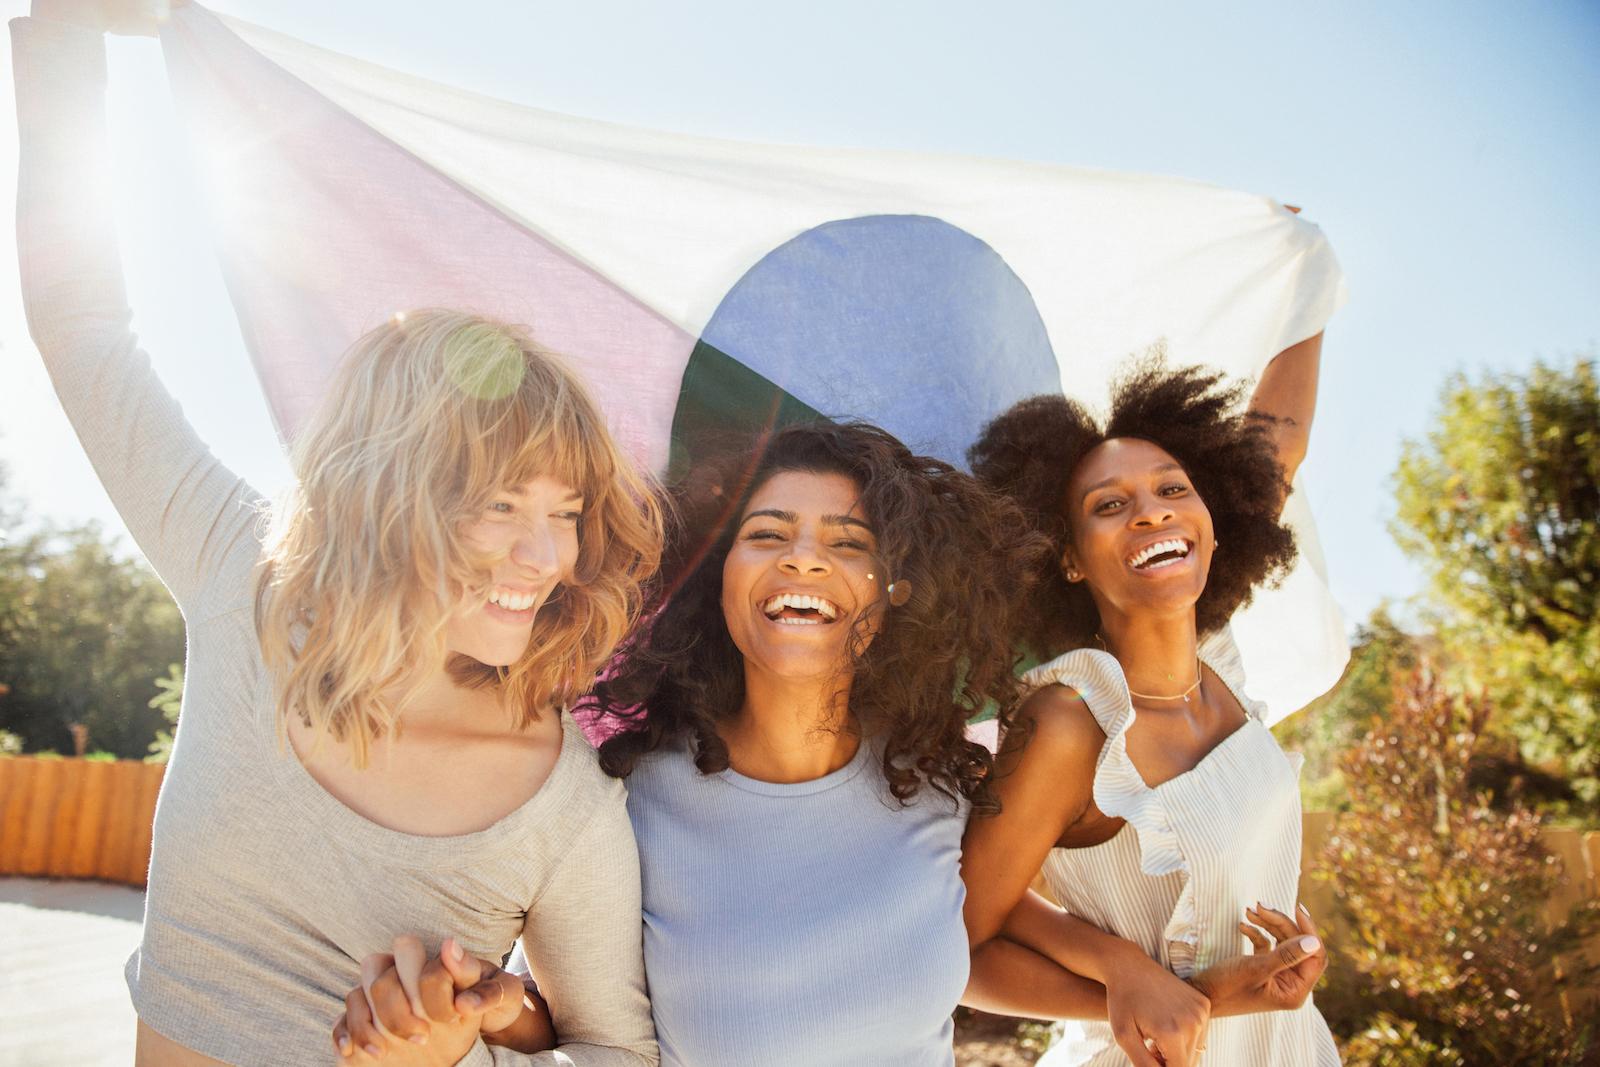 Lifestyle photo of 3 women holding the Alltrue Flag